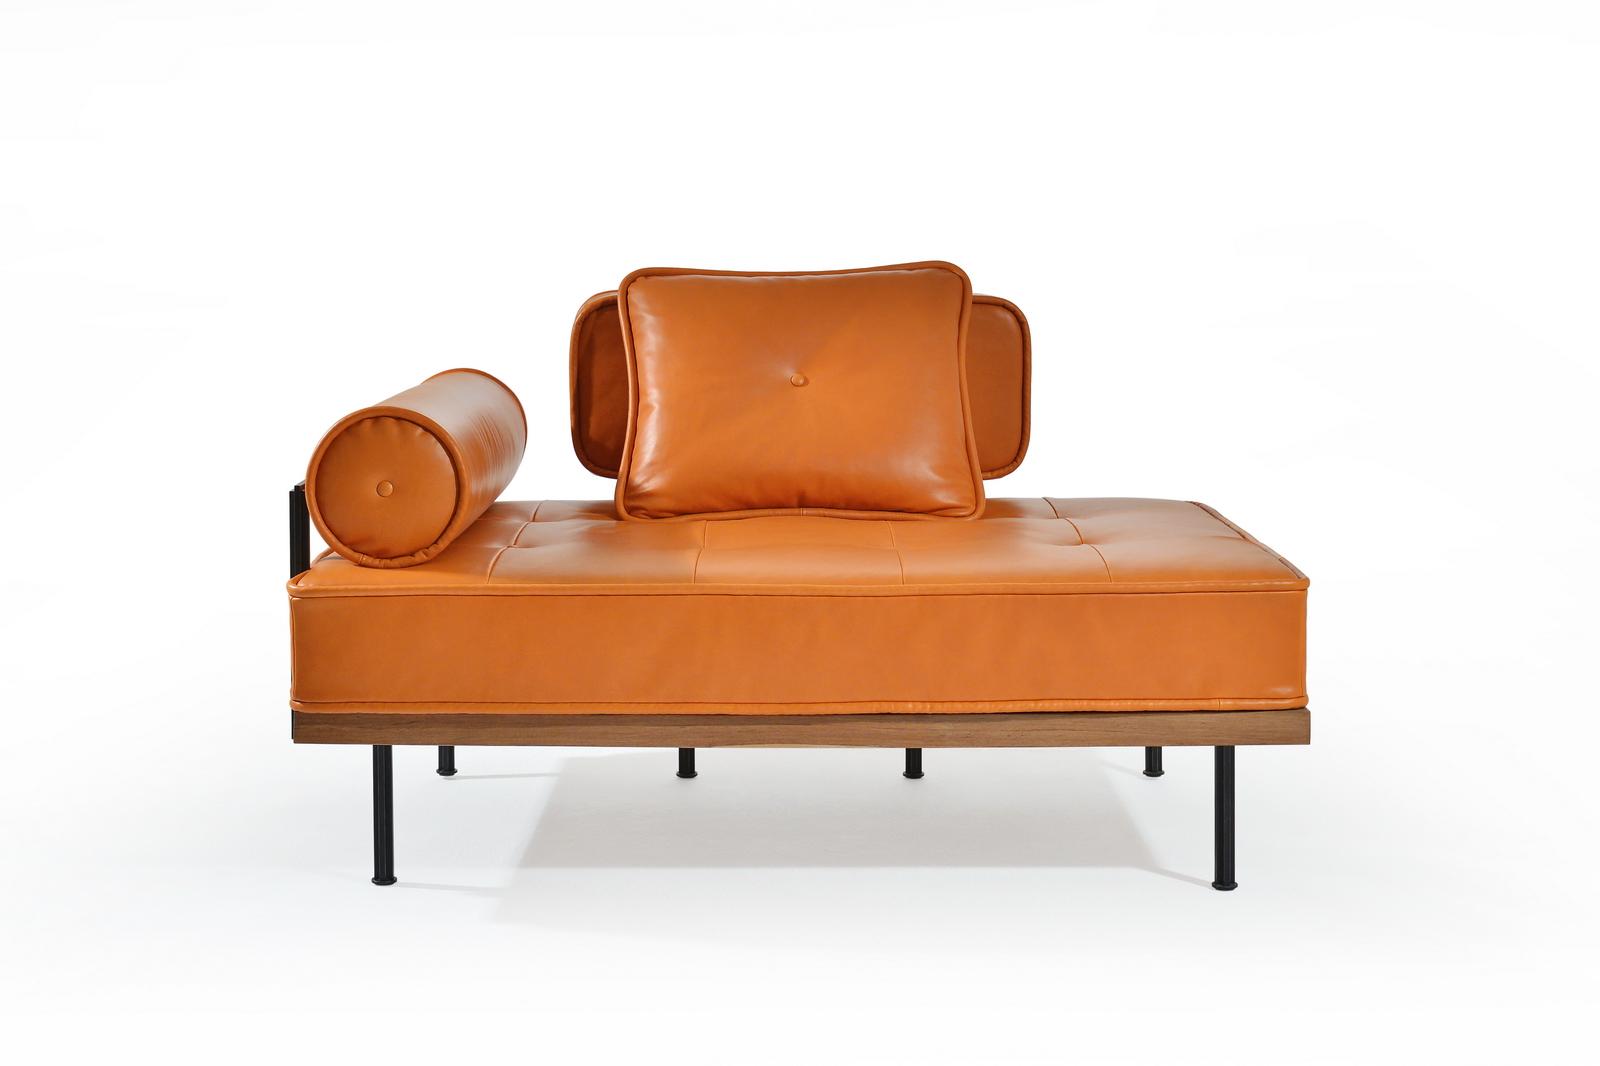 PTendercool-Sofa Corner-BS3-TE-BL-NO-Leather-210623-25